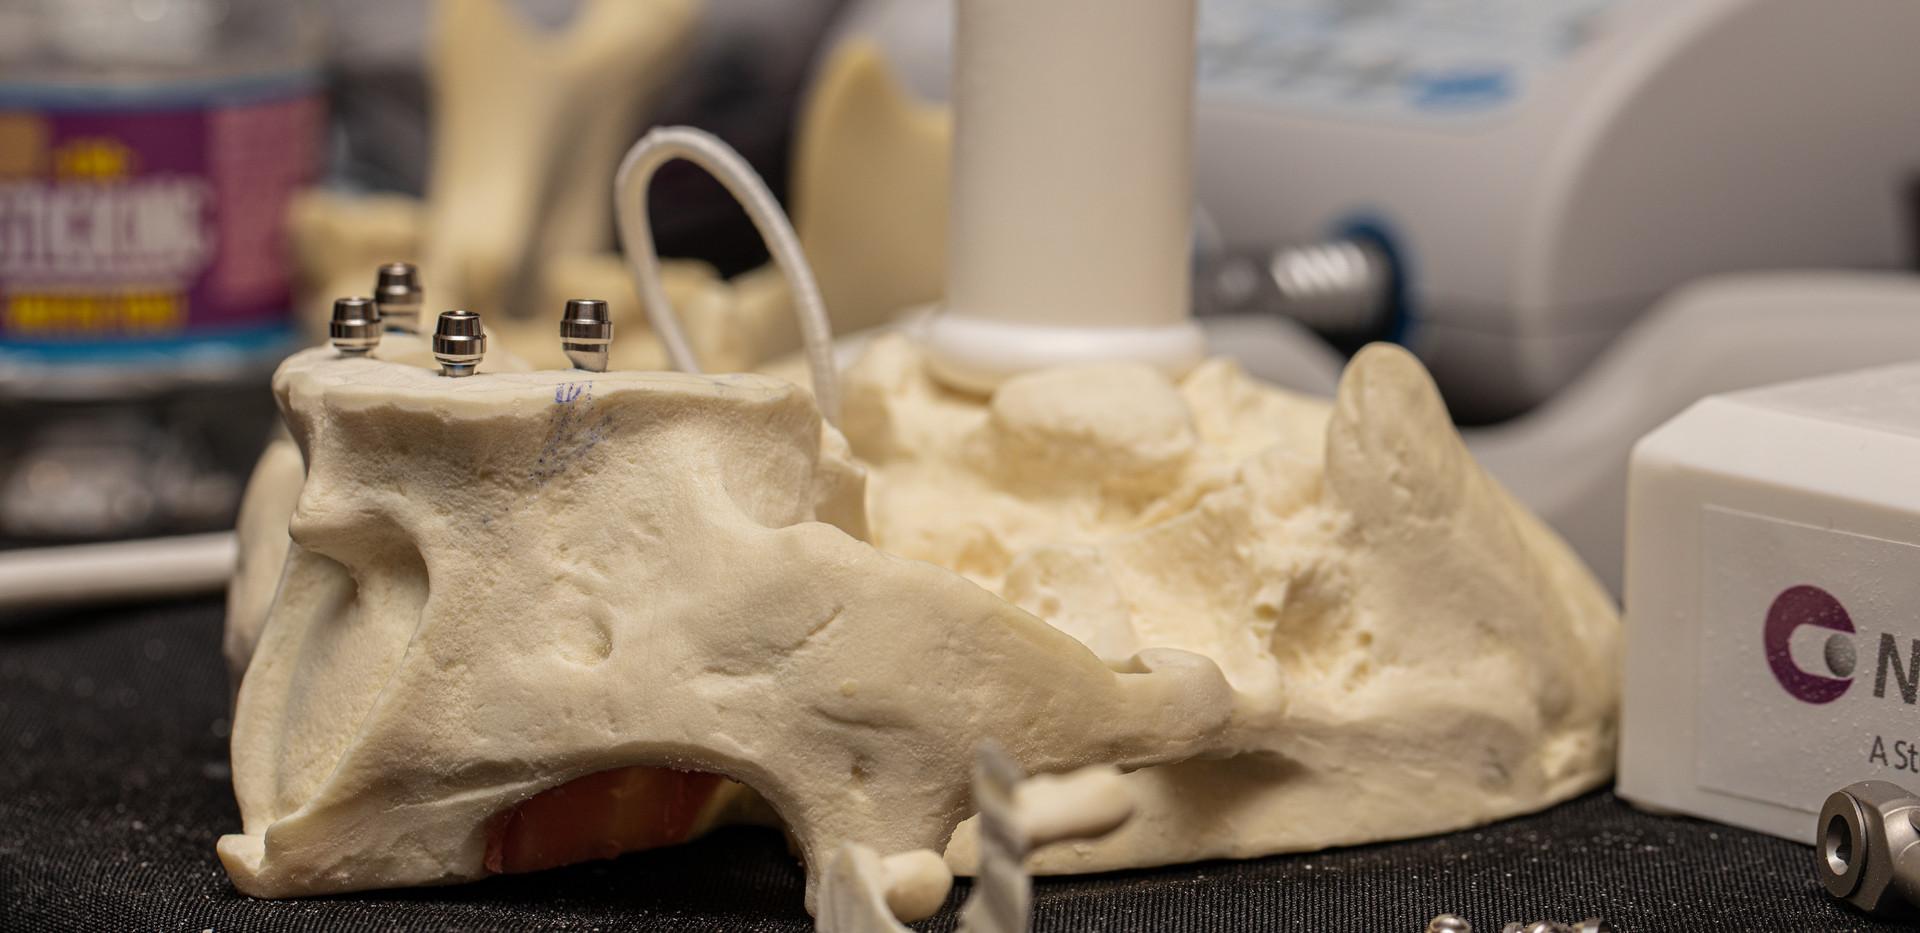 implant compare - peyman course-17.jpg